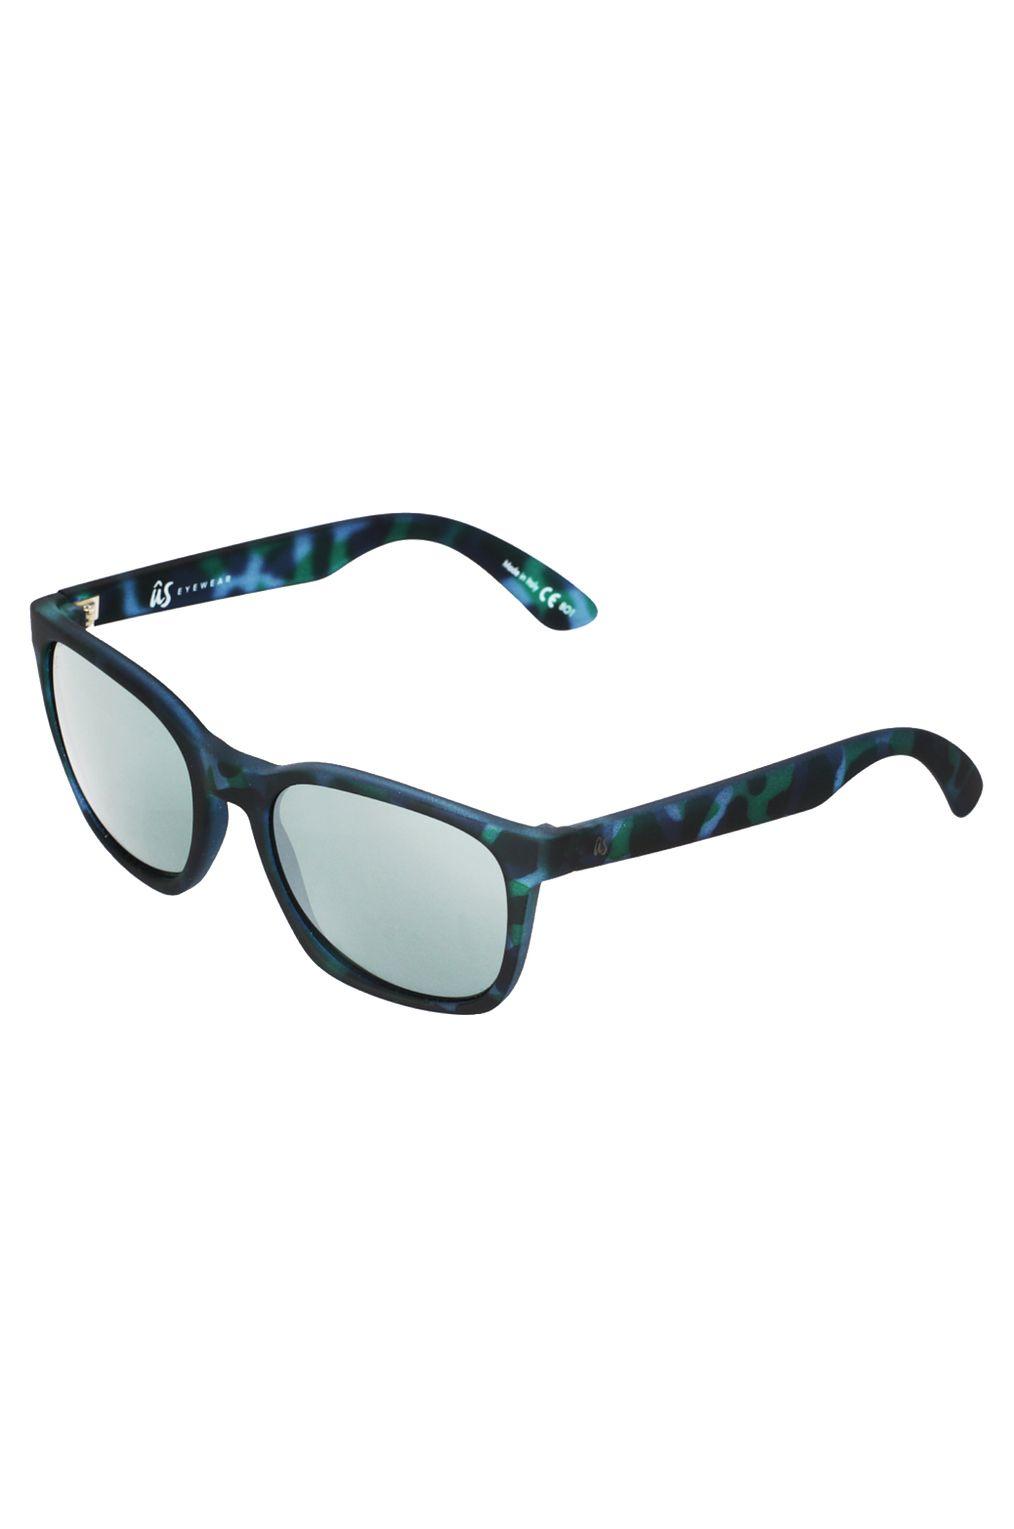 US Sunglasses BARYS Blue Tort/Grey Silver Chrome